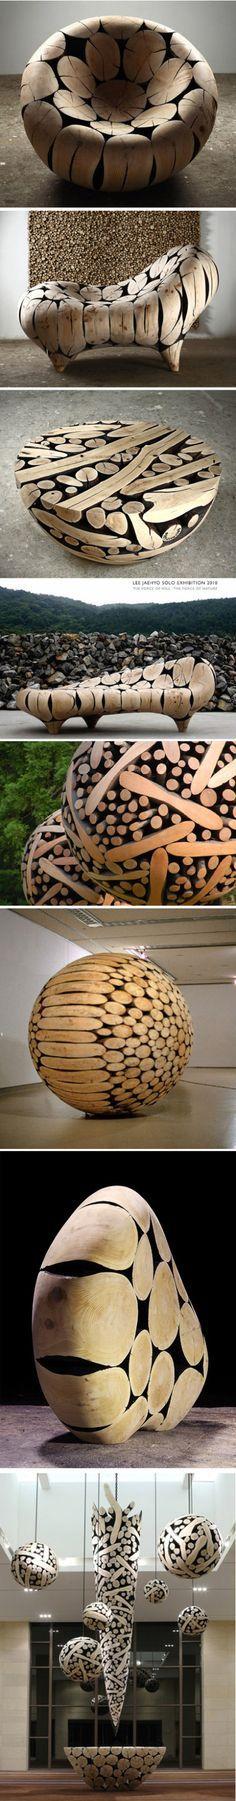 Log Art http://www.leeart.name/Gallery/Wood/Default.asp Lee Jae-Hyo _ 1965 Born in hapchen, Korea